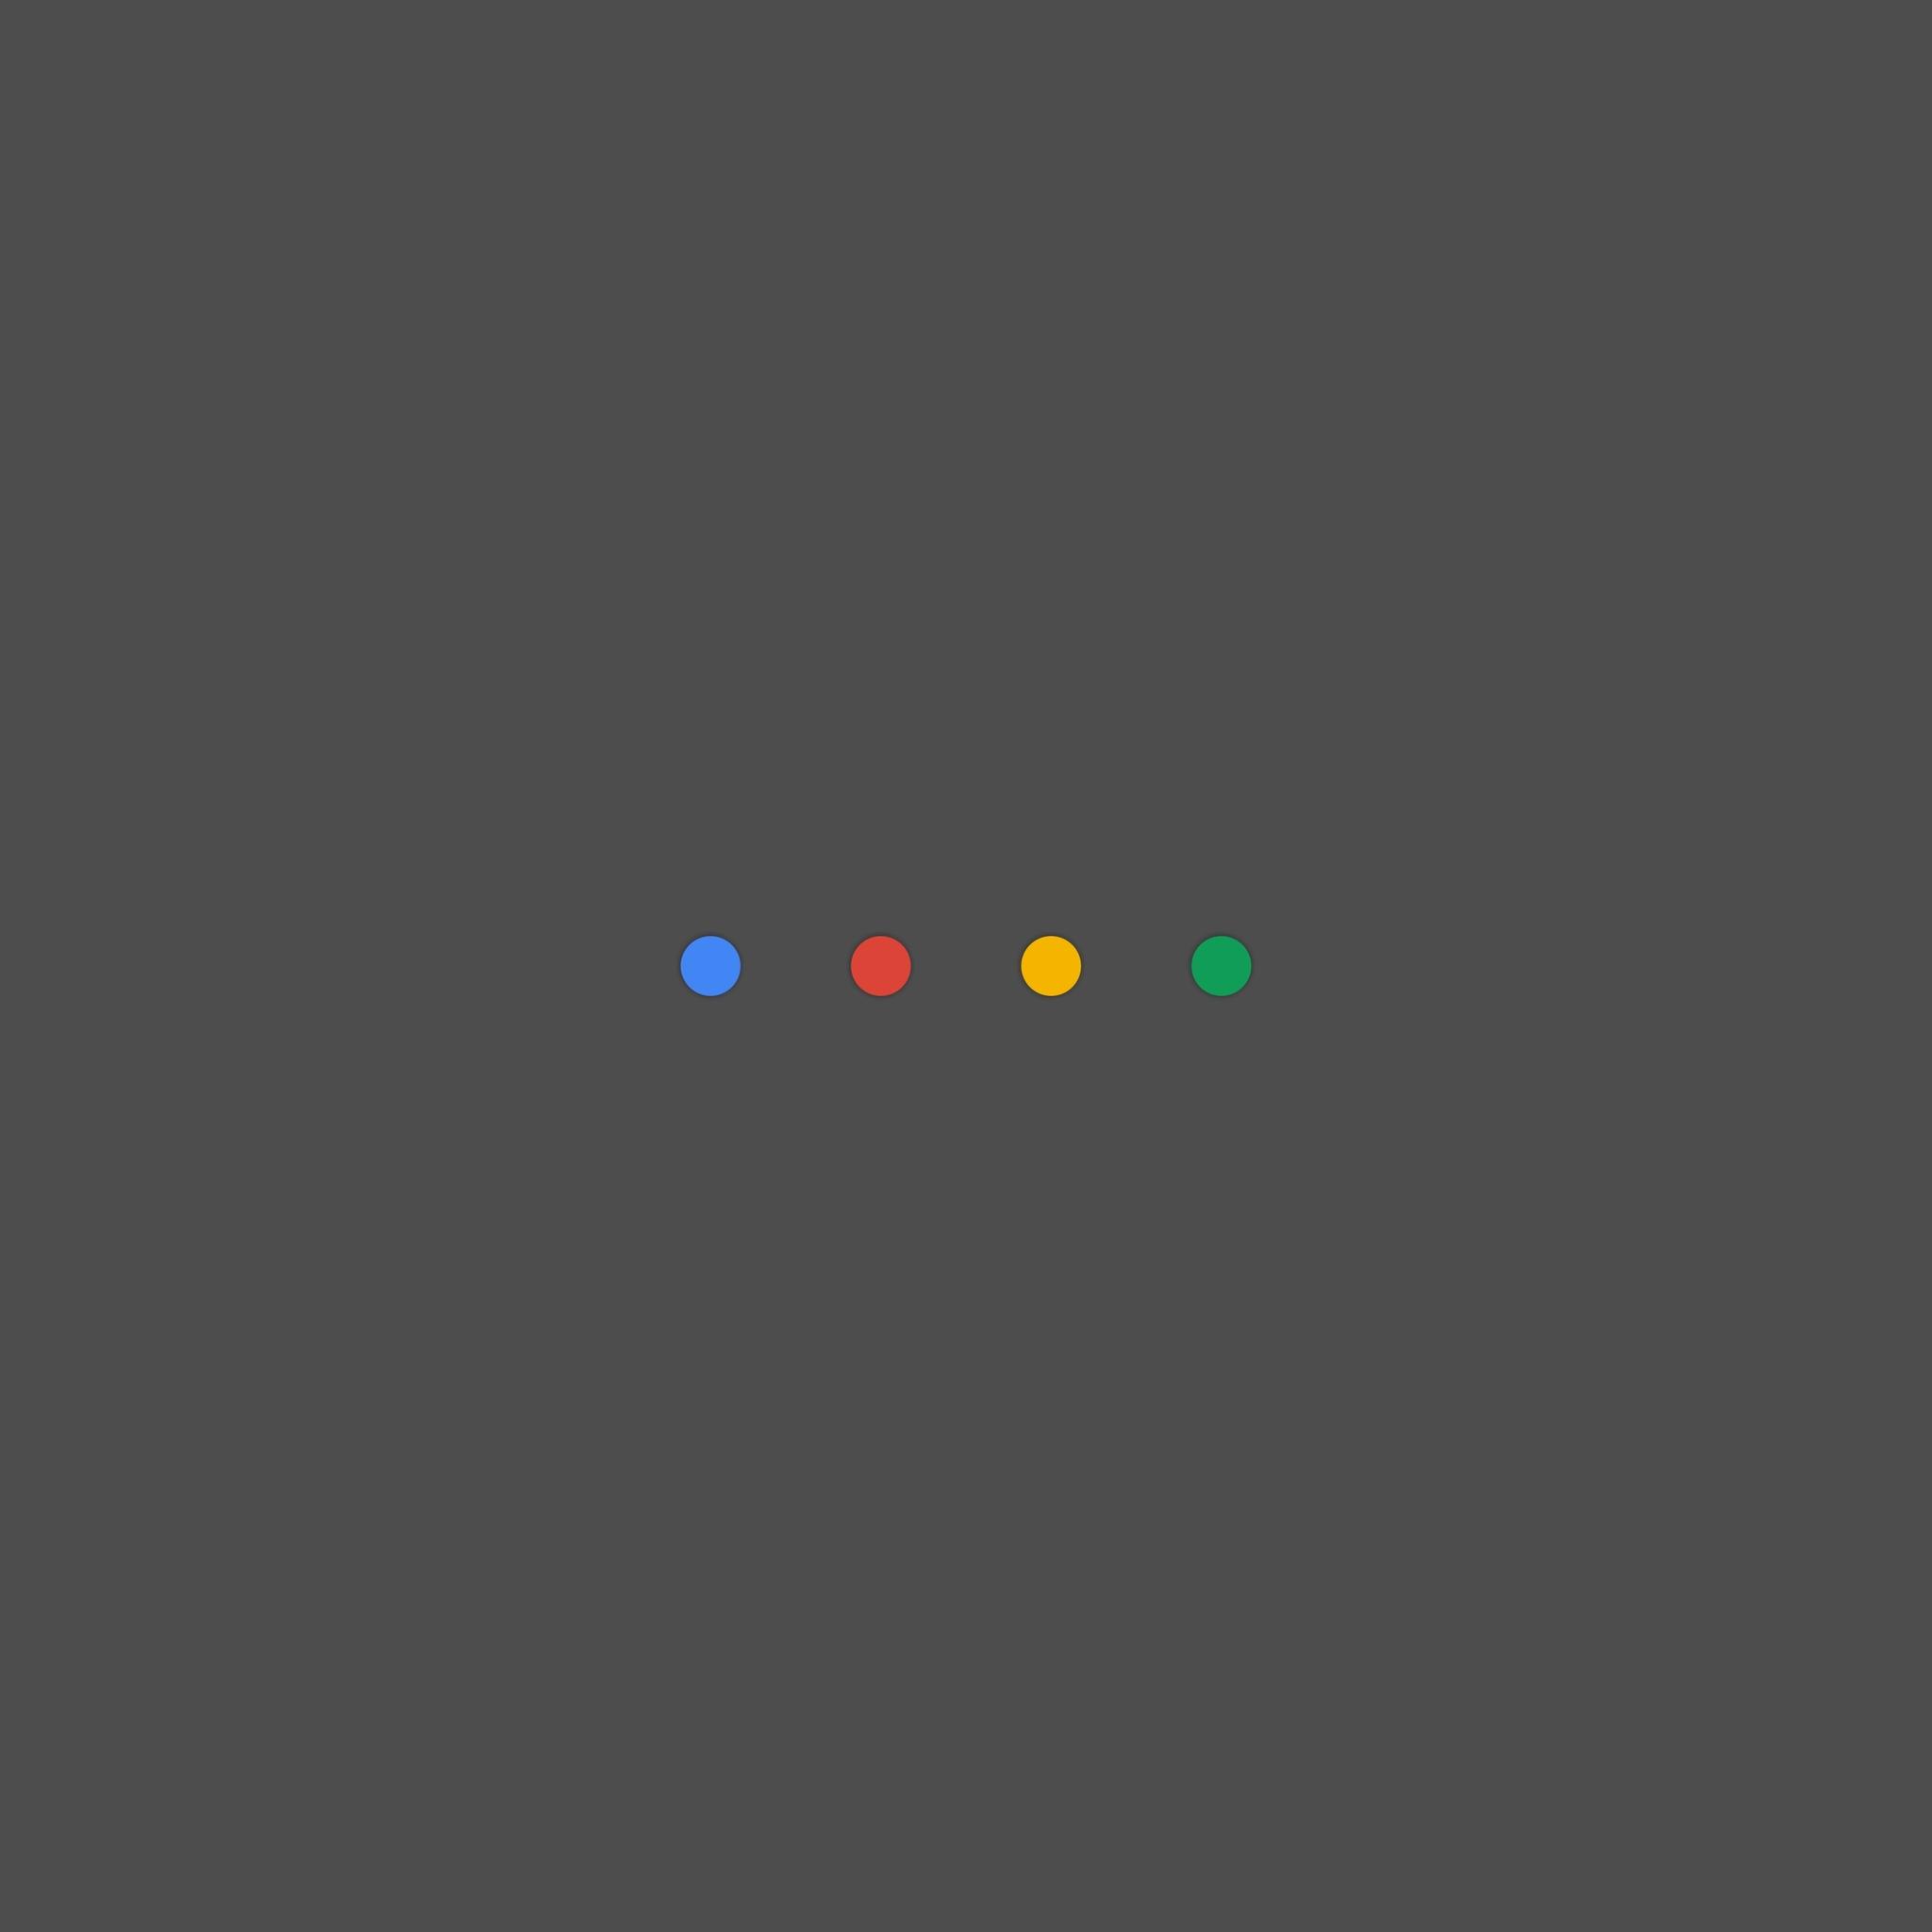 2048x2048 Abstract Google Loading 4k Ipad Air Hd 4k